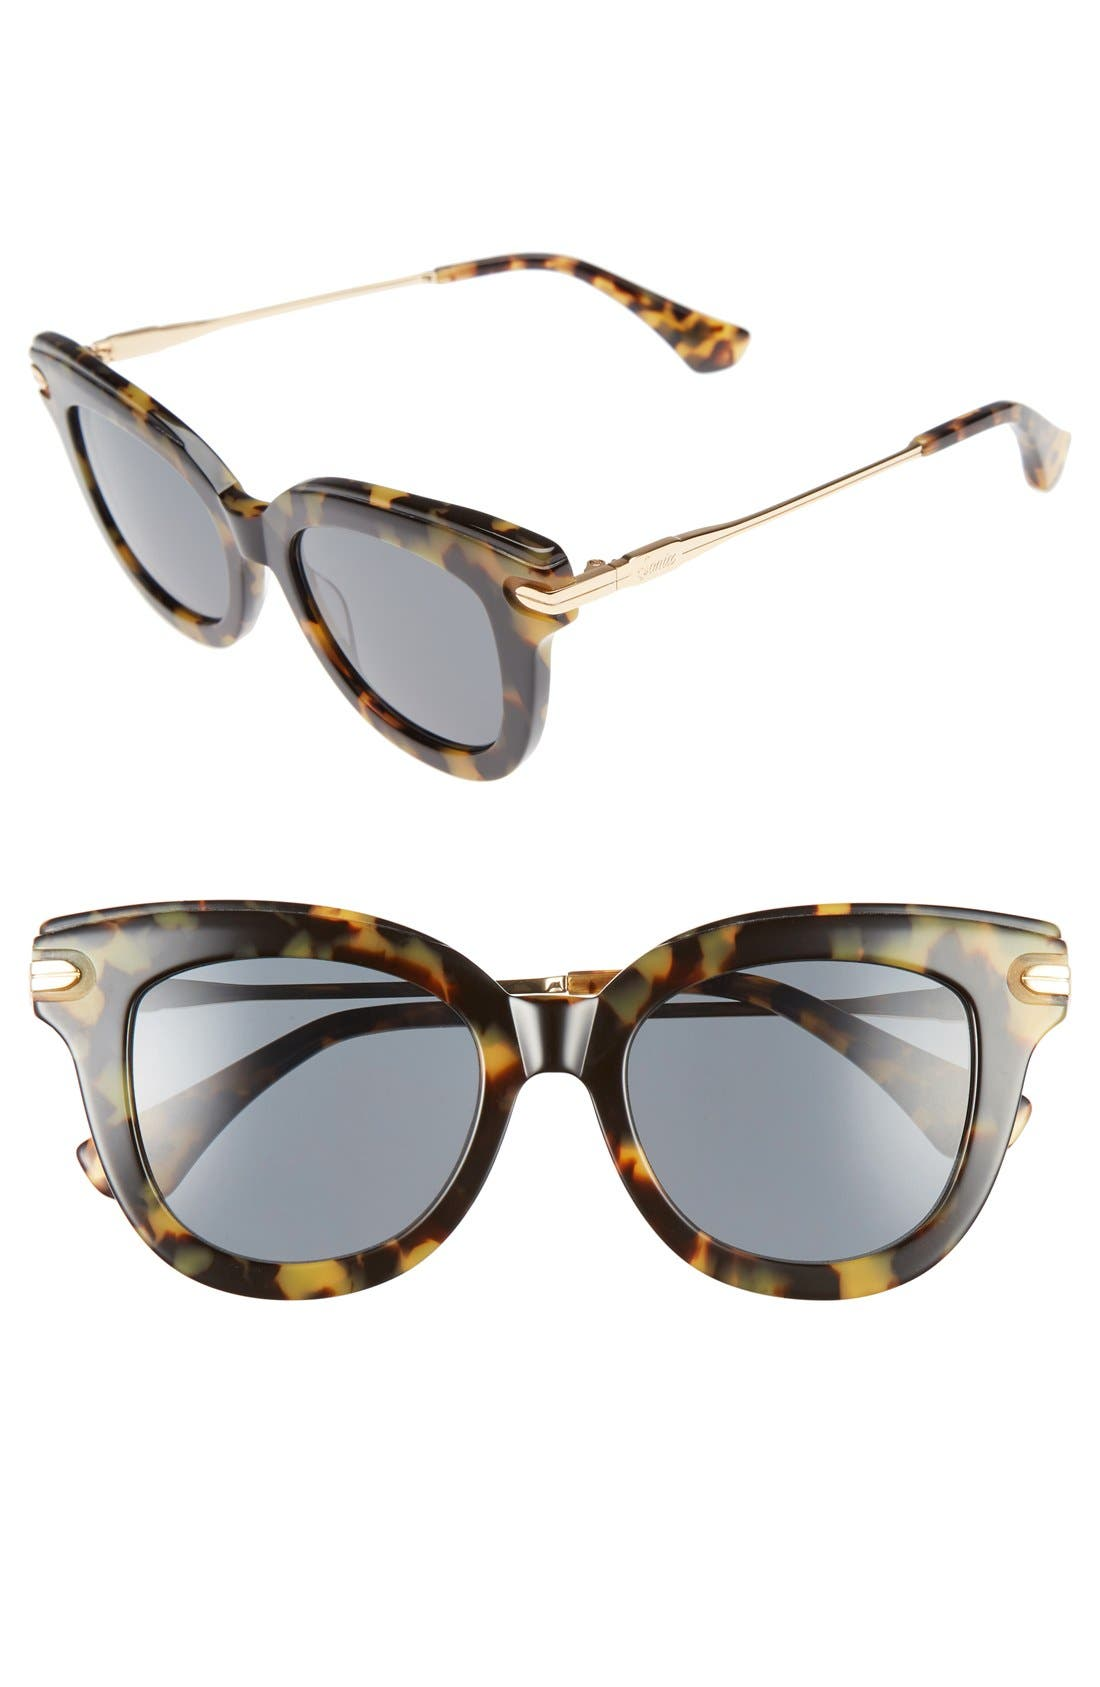 Sonix Elliot 48mm Cat Eye Gradient Sunglasses